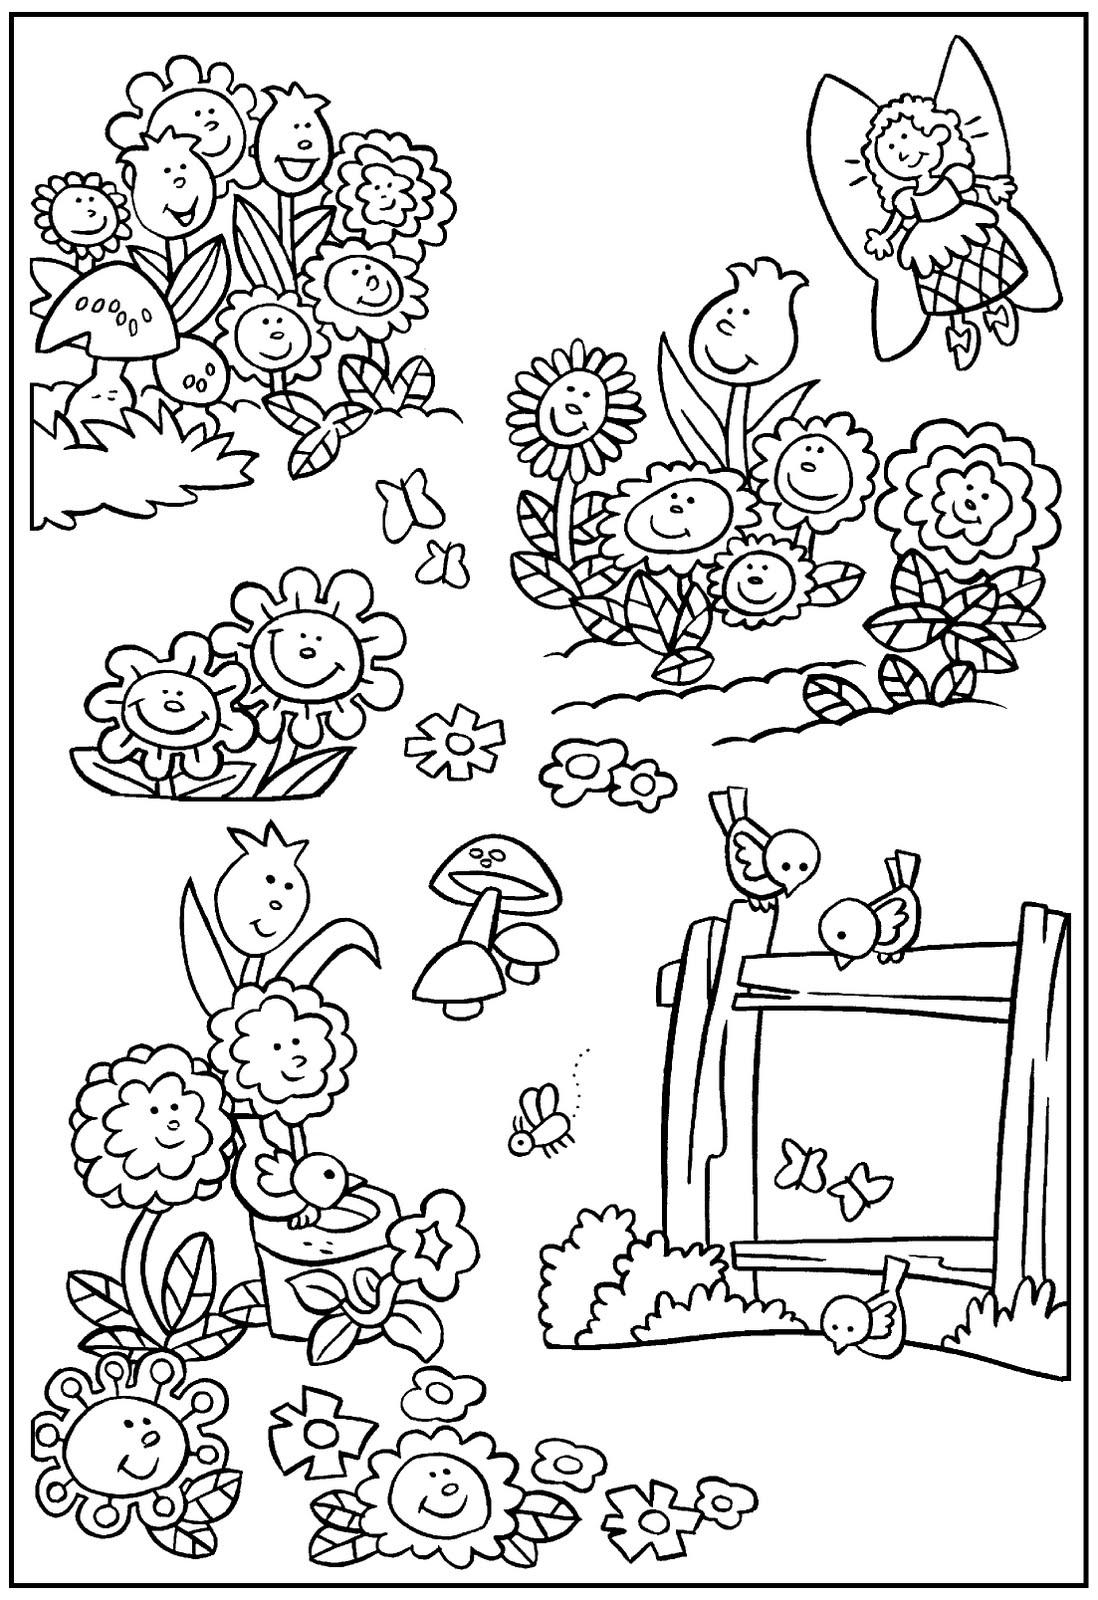 colouring pages garden simple garden coloring pages getcoloringpagescom pages colouring garden